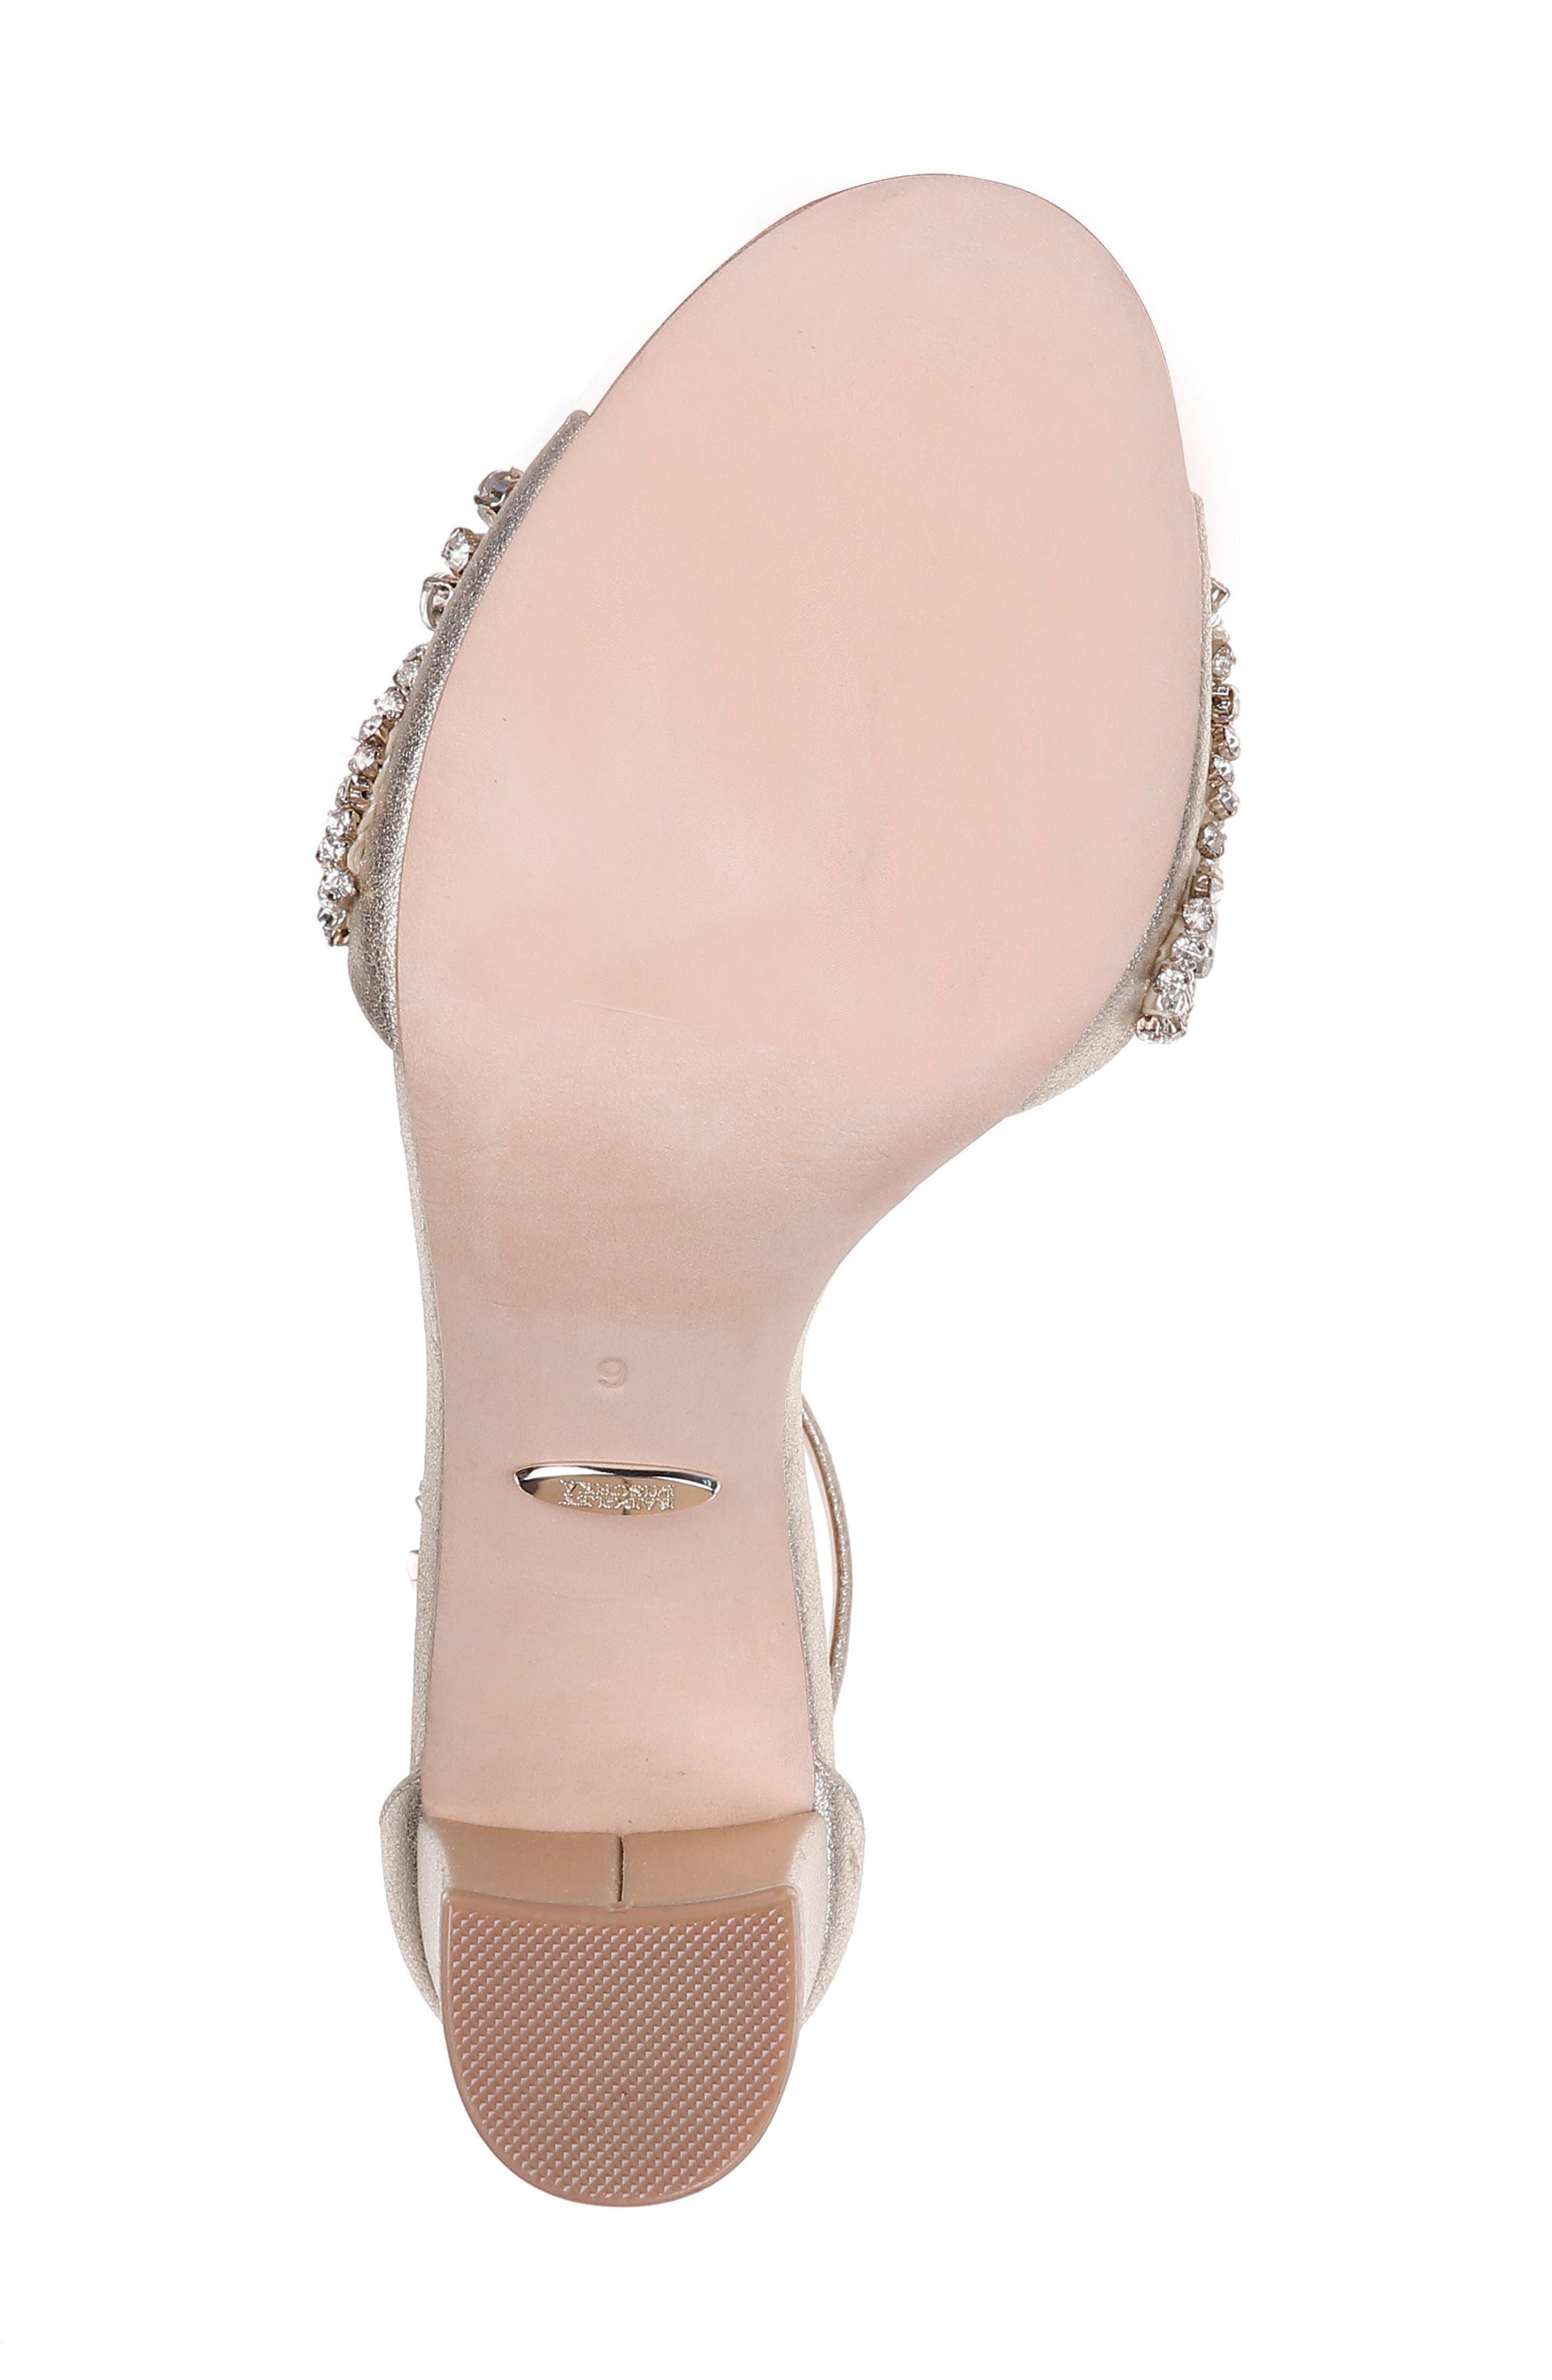 Hines Embellished Block Heel Sandal,                             Alternate thumbnail 6, color,                             040